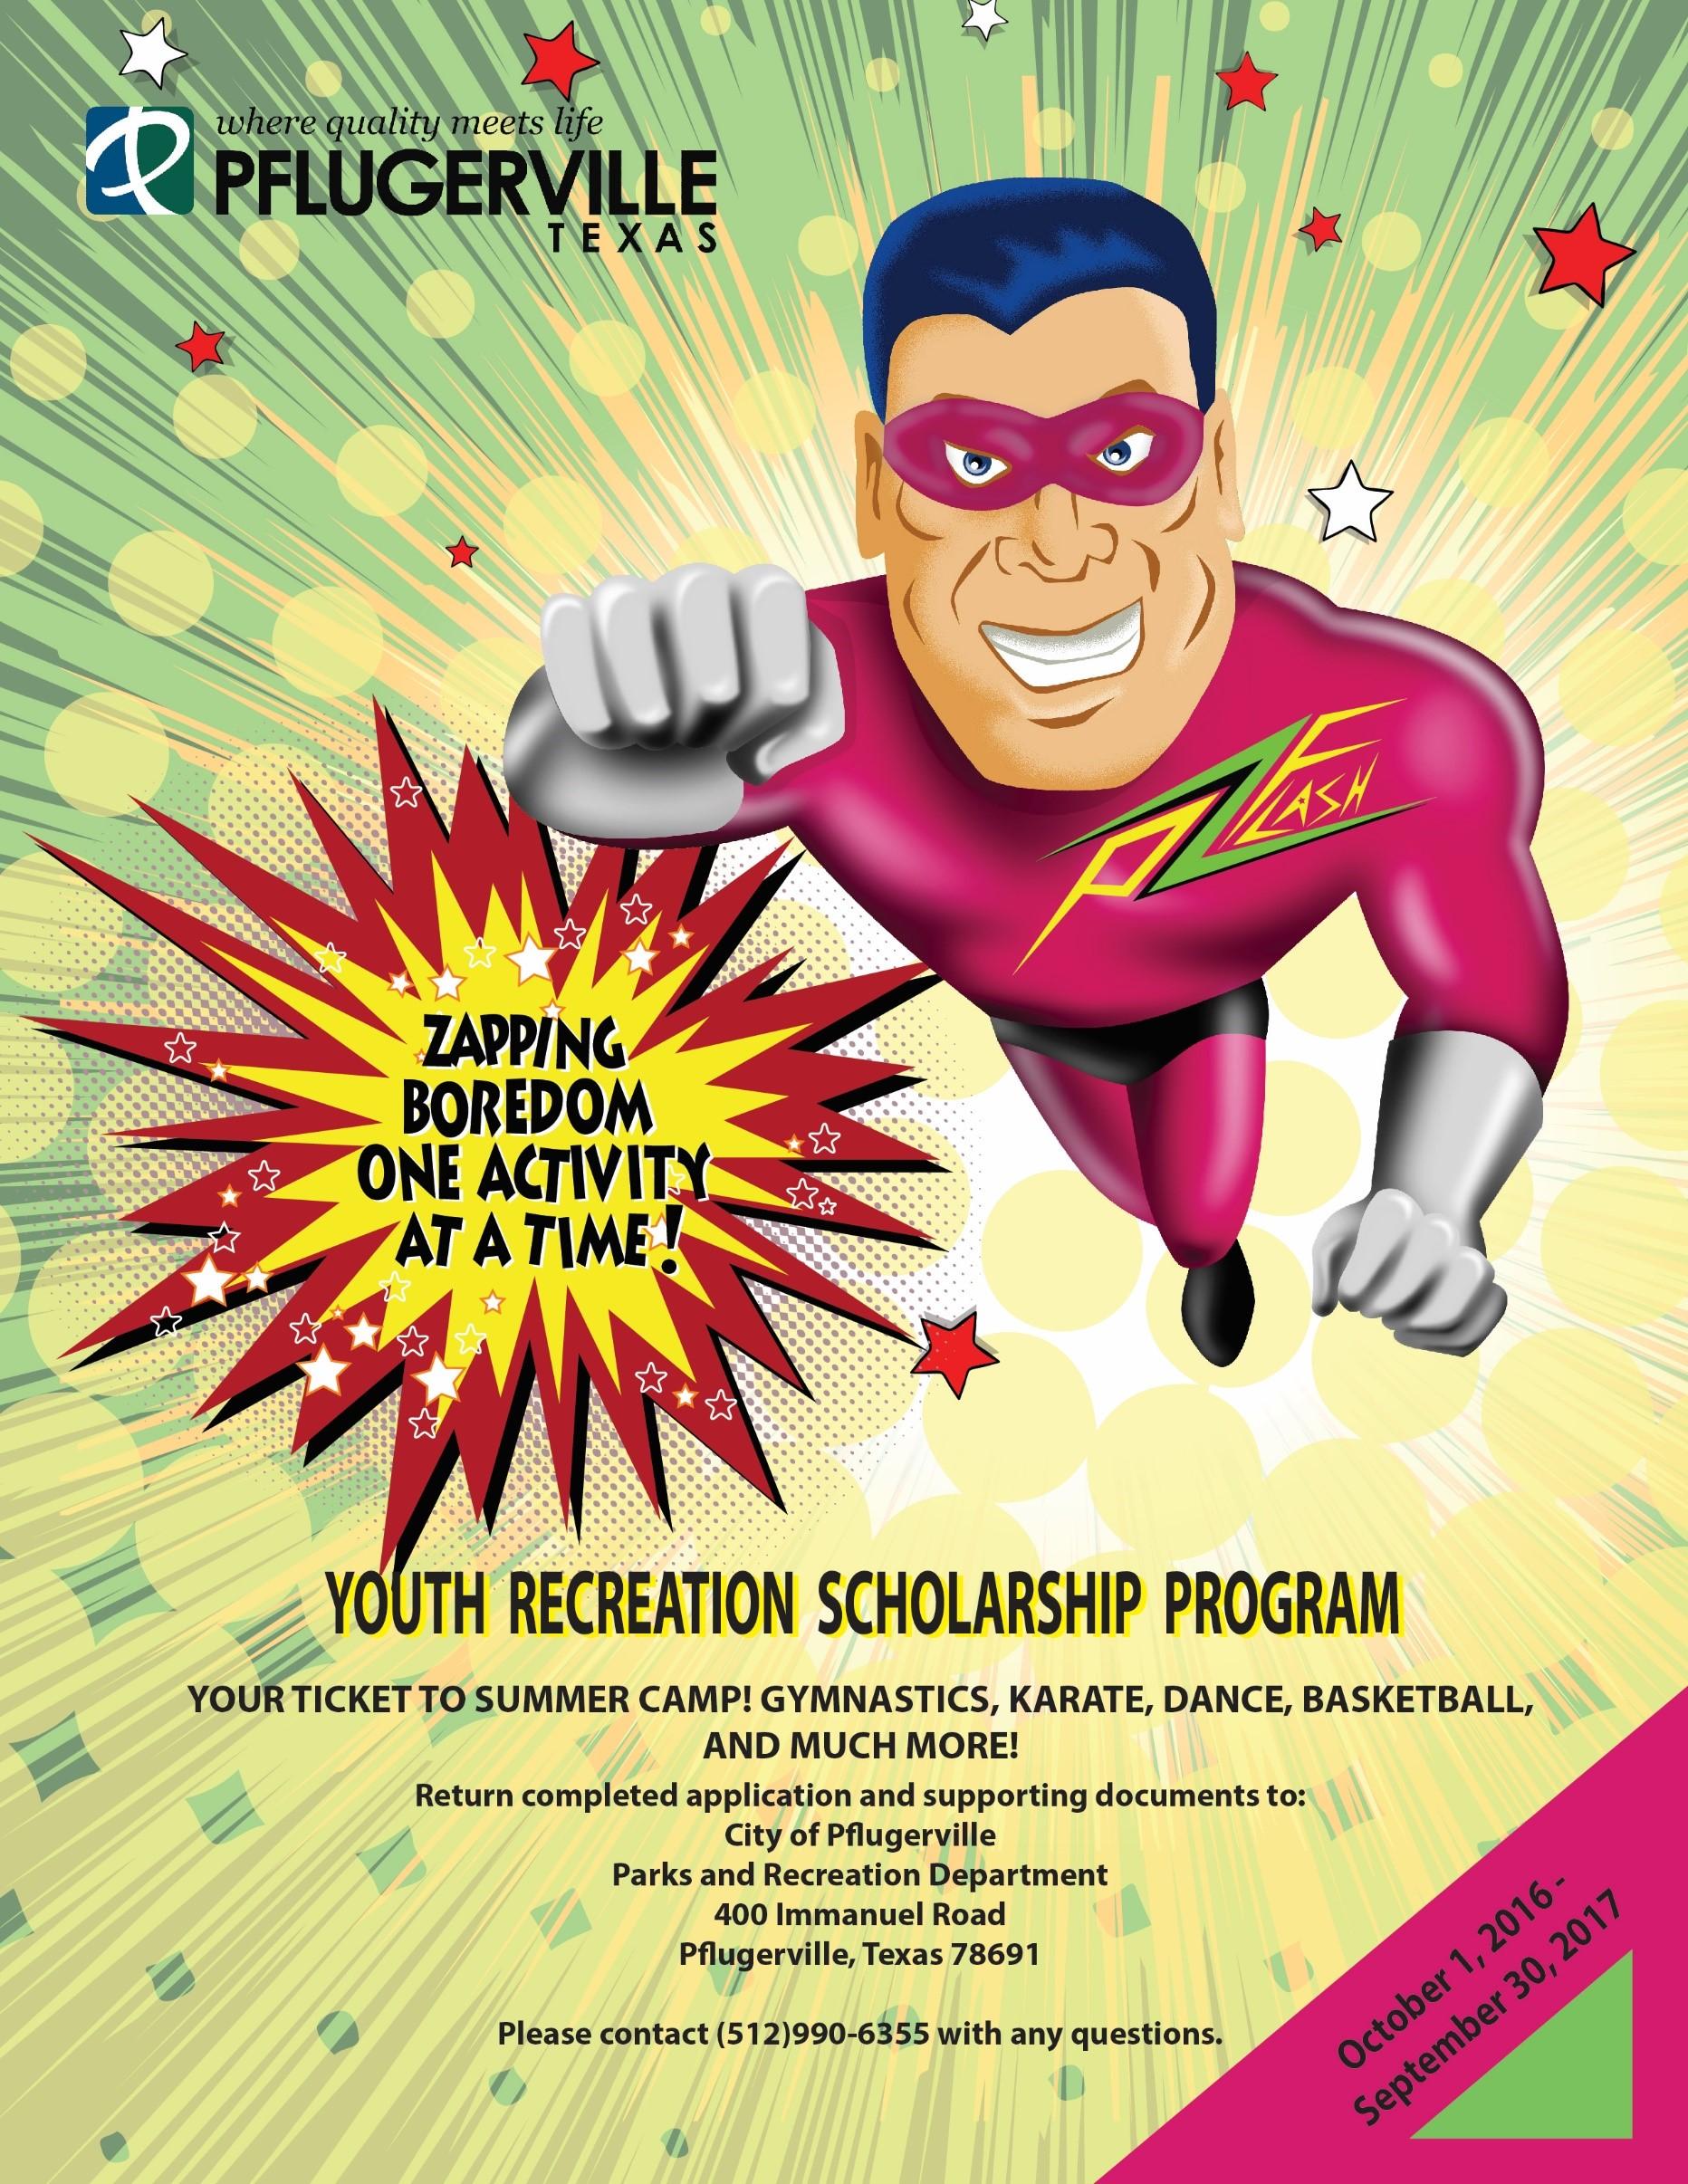 Youth Recreation Scholarship Program